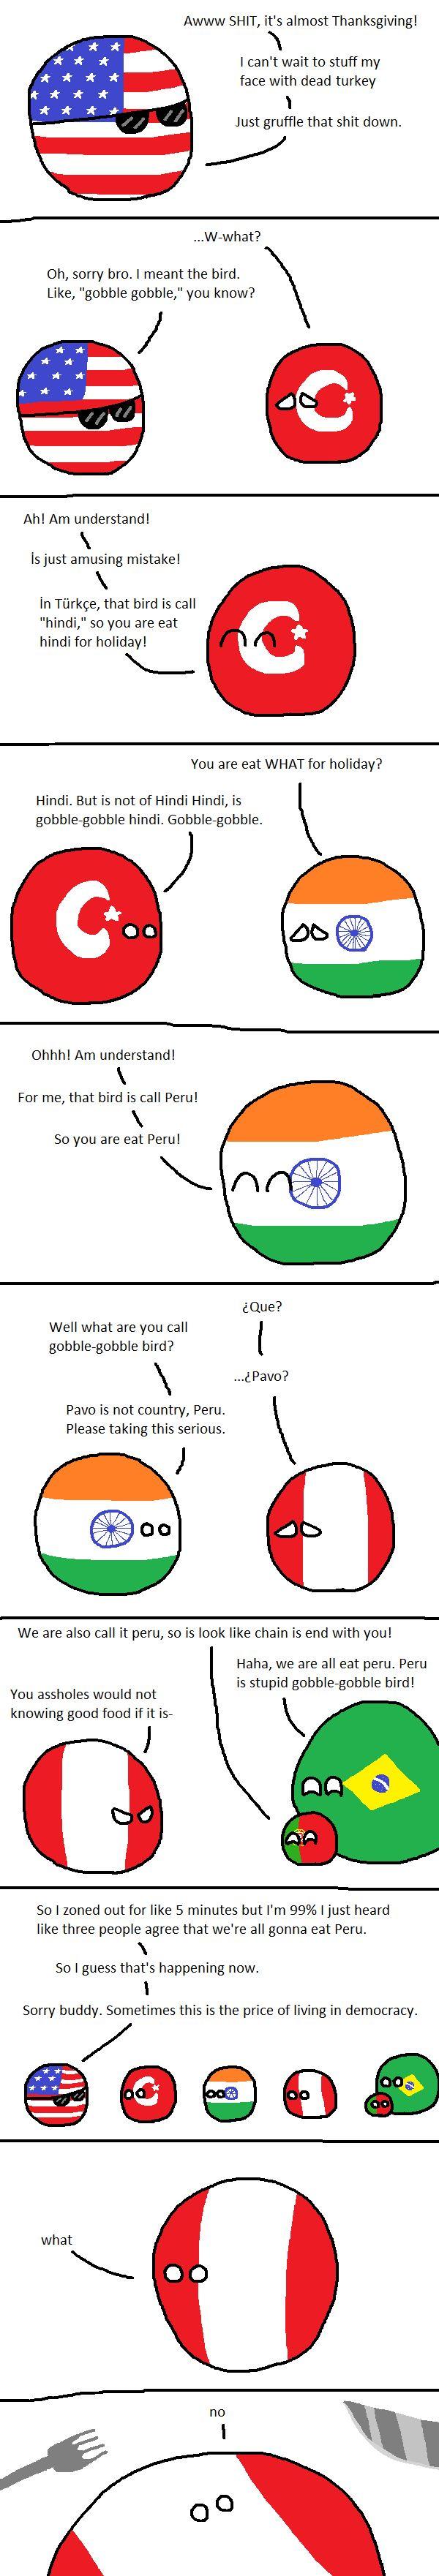 Eating Turkey (USA, Turkey, India, Peru, Brazil, Portugal) by FVBLT #polandball #countryball